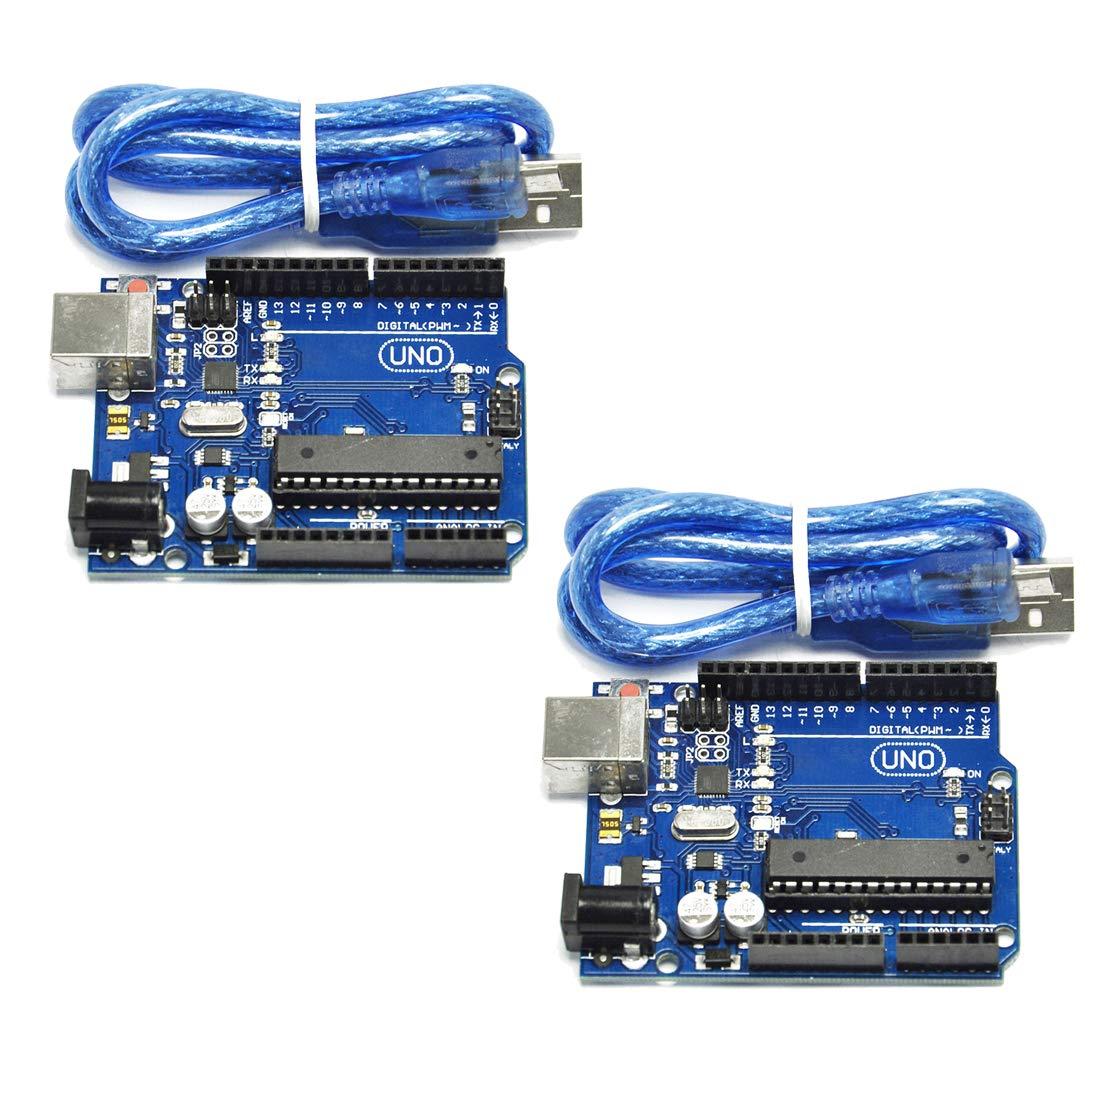 HiLetgo 2pcs UNO R3 ATmega328P ATMEGA16U2 Development Board Compatible with UNO R3 Arduino by HiLetgo